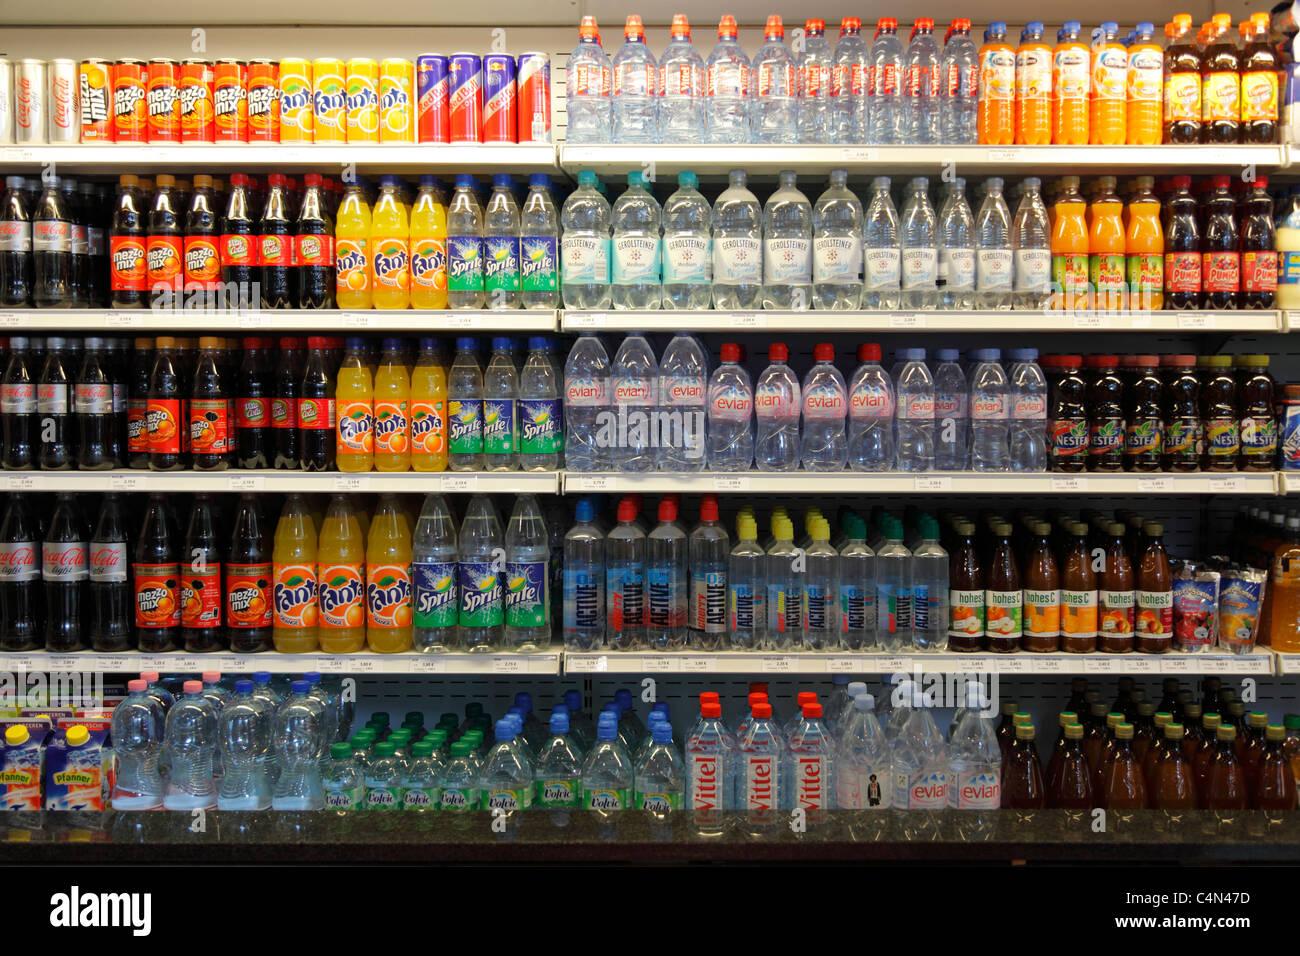 Kühlschrank Regal : Alkoholfreie getränke im kühlschrank regal stockfoto bild